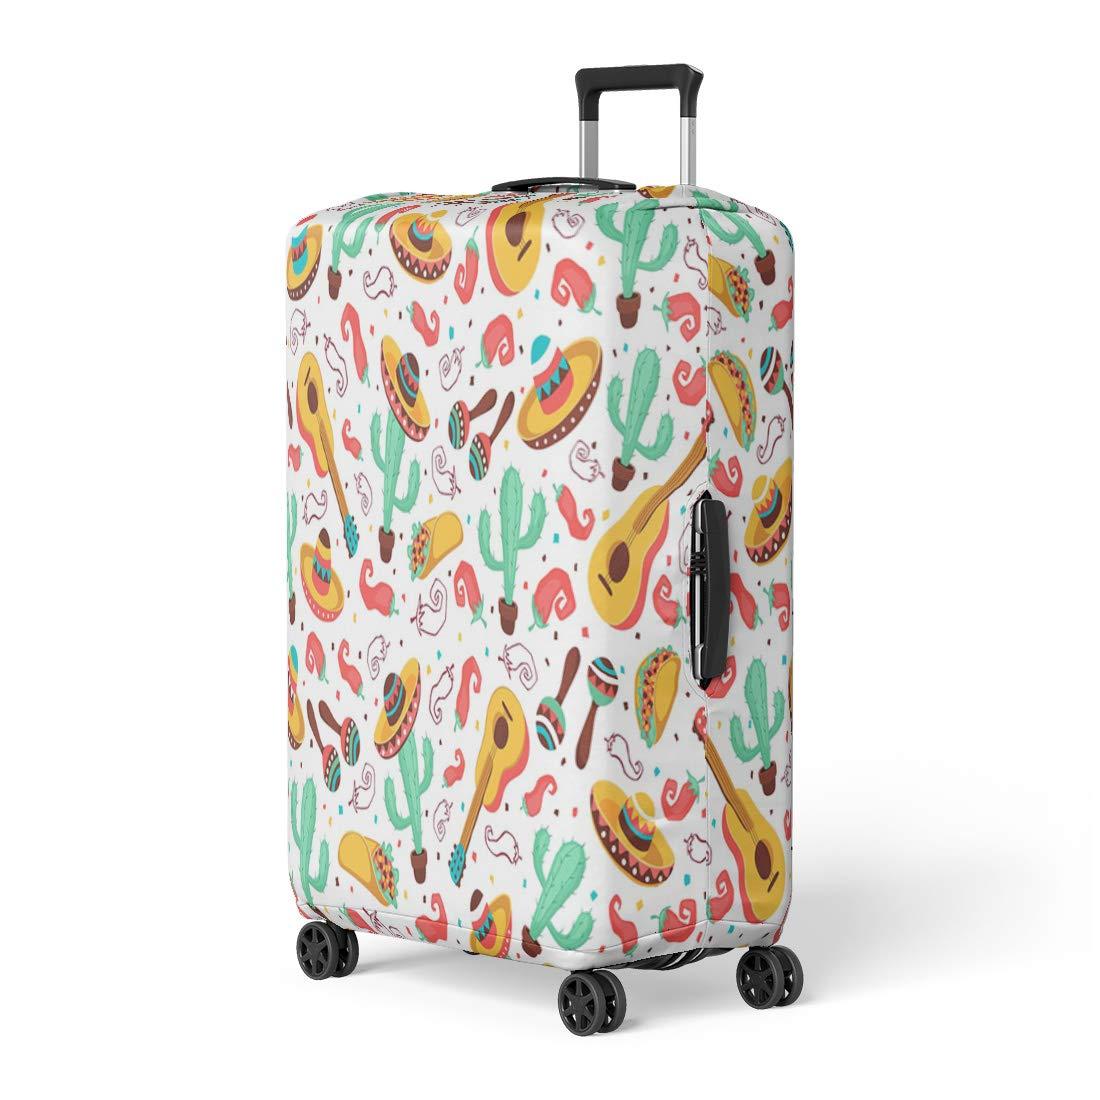 f2a592fe0f76 Amazon.com: Pinbeam Luggage Cover Pink Princess Three Cute Little ...